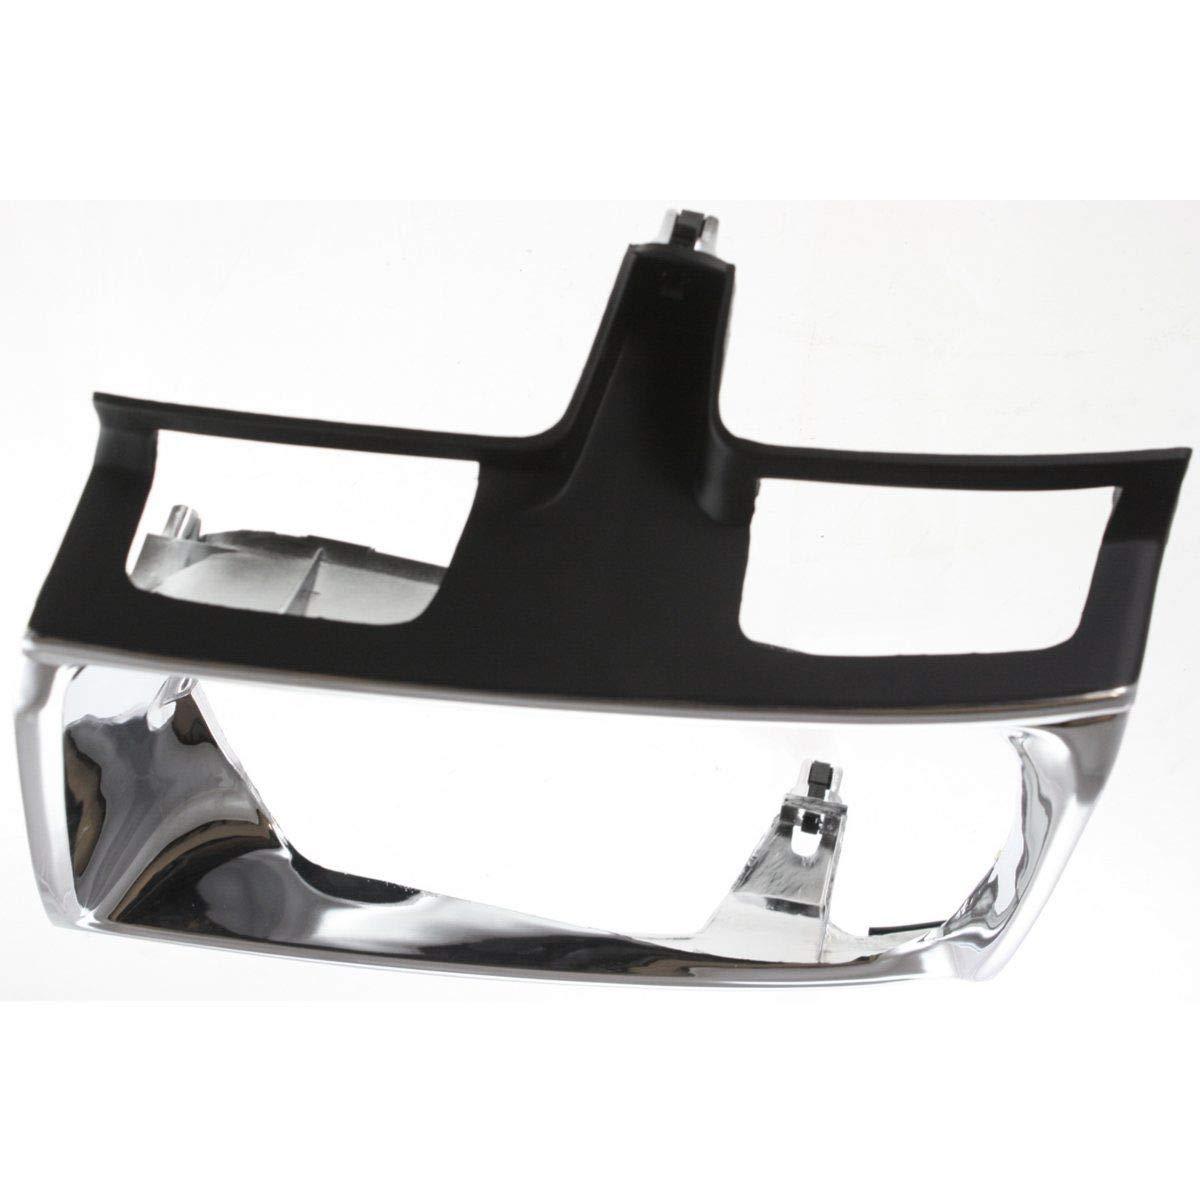 New Head light Headlight Door Headlamp Bezel Passenger Right Side Chrome